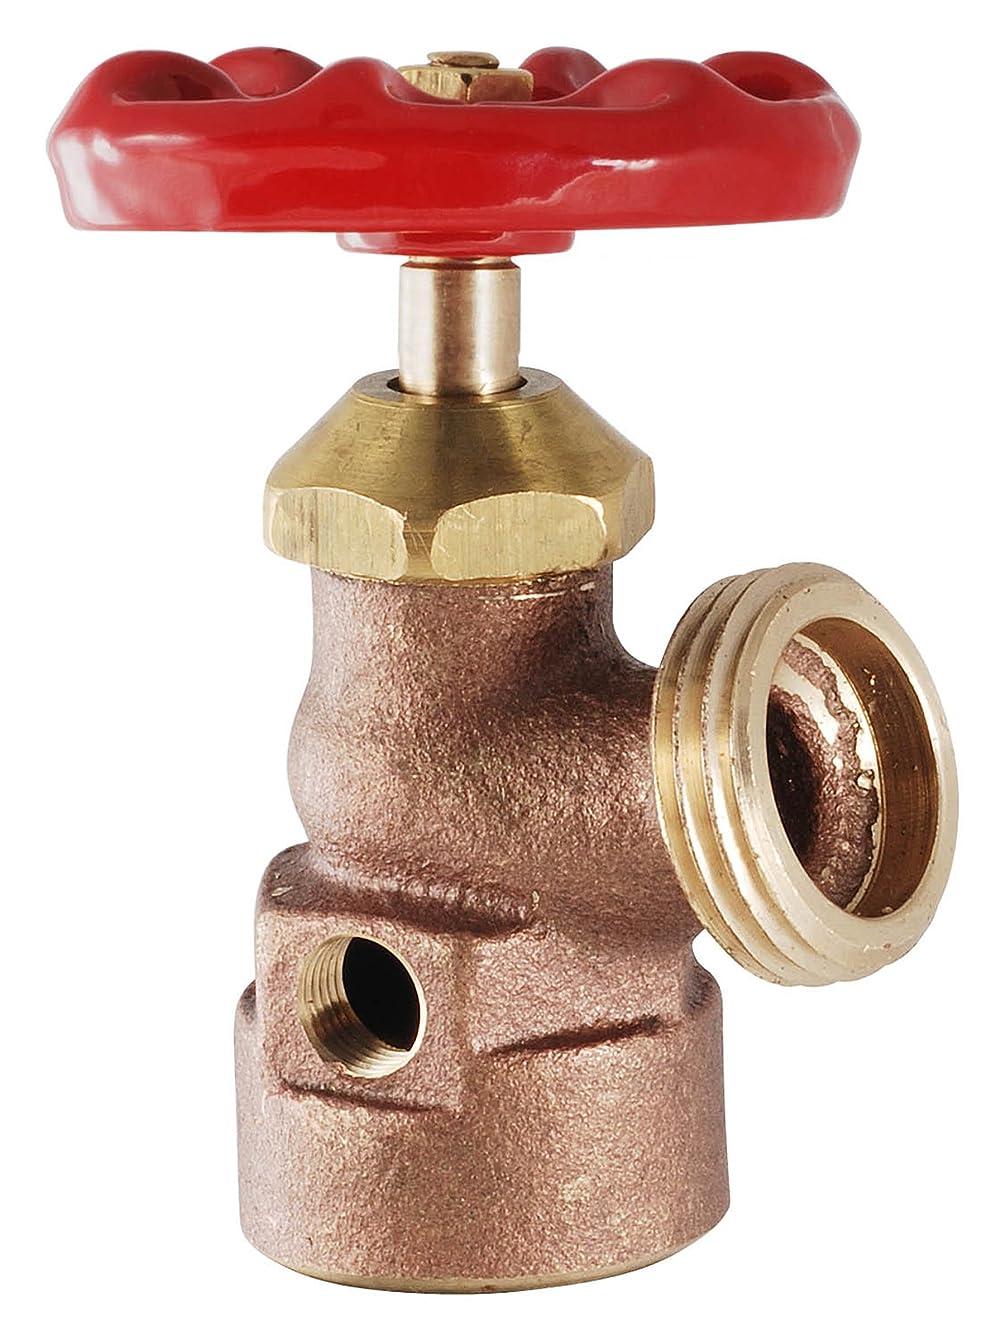 LDR Industries 020 7424 Thread Brass Evaporative Cooler Valve